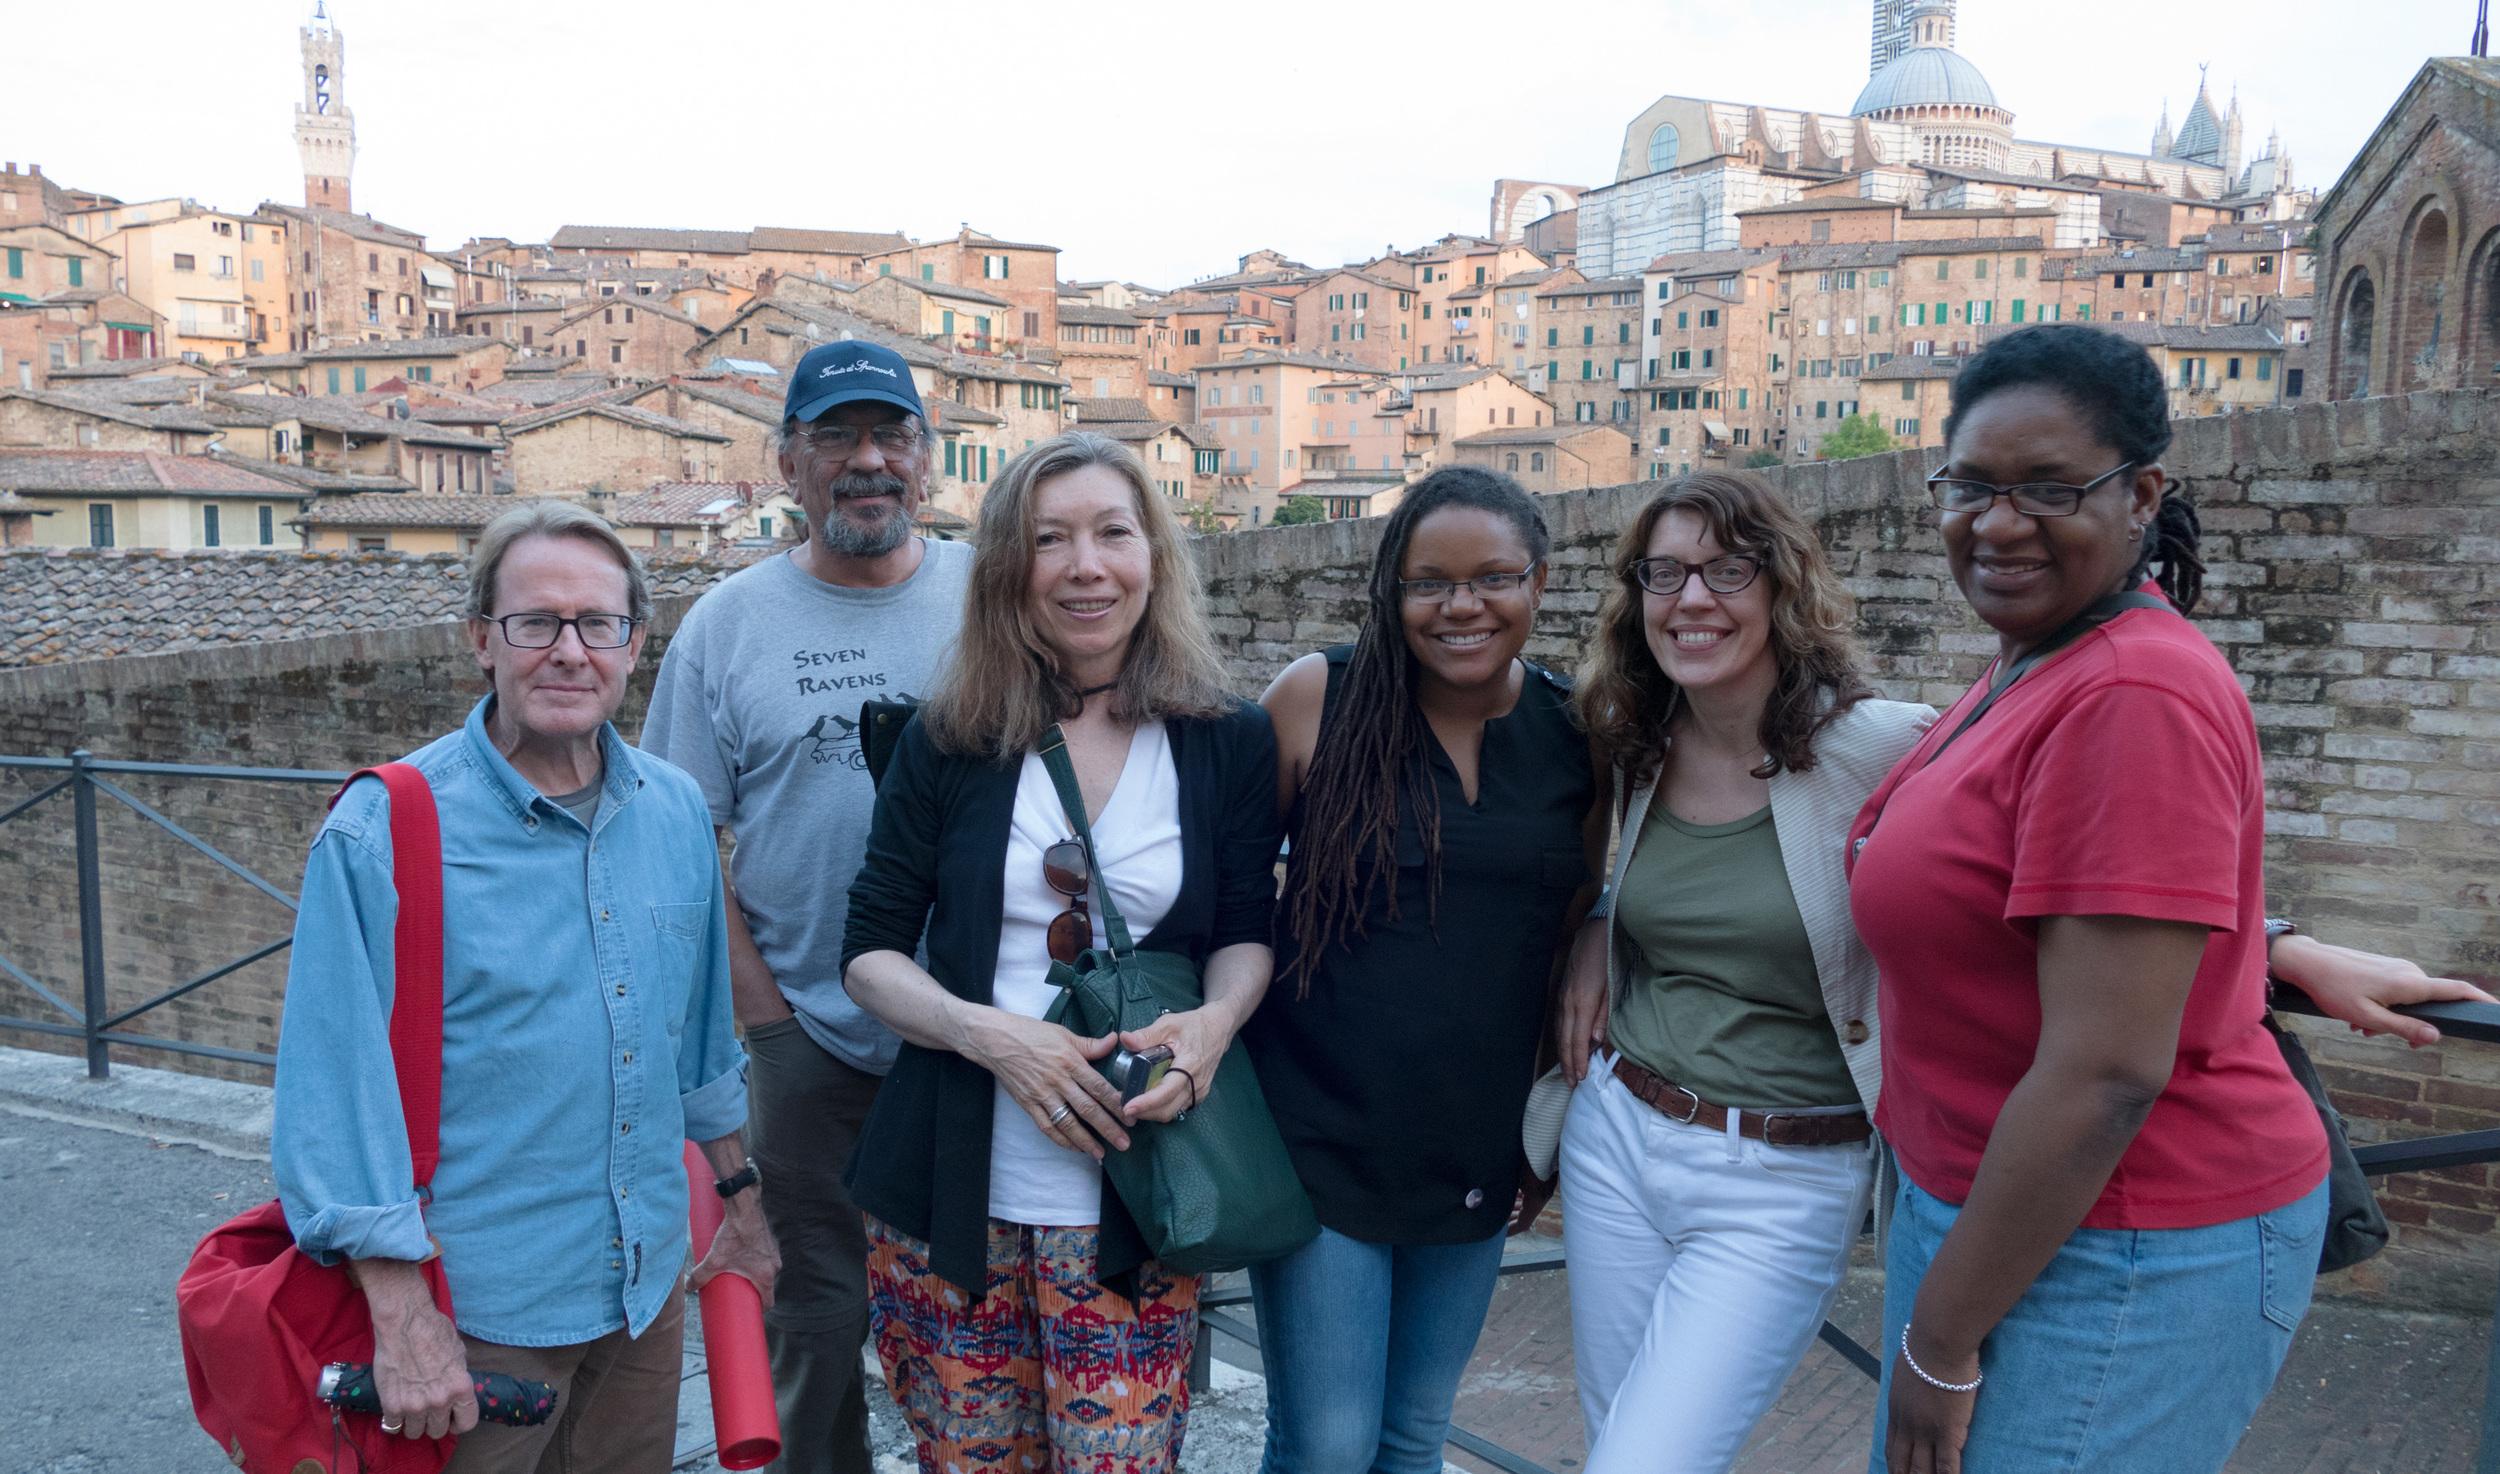 From left to right – Christopher Huck '15, Joseph Keenan '15, Liza Papi '14, Zoma Wallace (David Driskell Fellow '15), Simonetta Moro (Director of IDSVA), Kaneem Smith '15